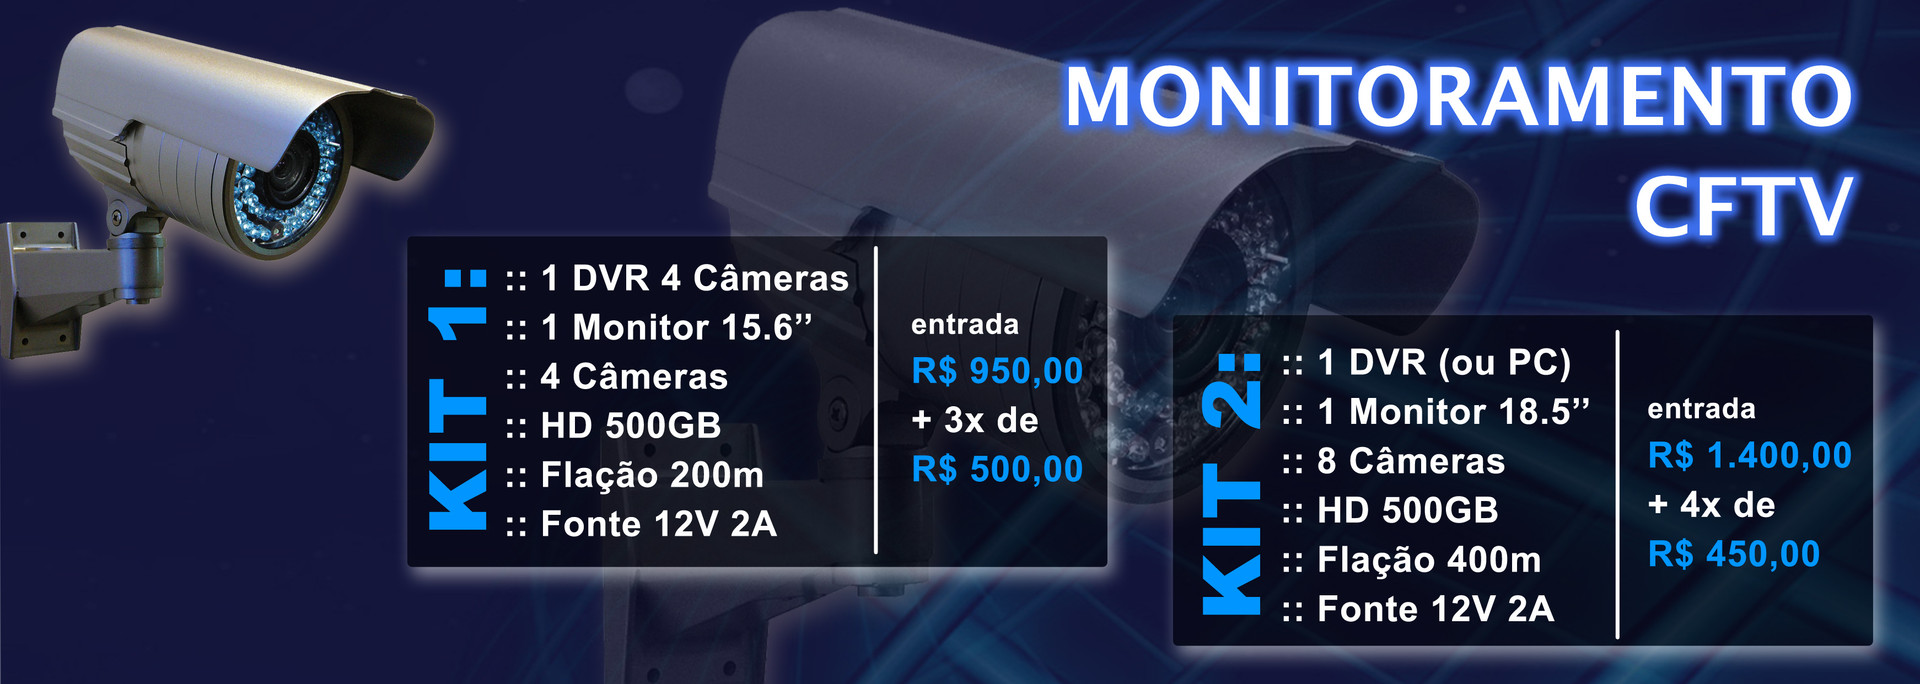 BANNER_Monitoramento+CFTV+c%C3%B3pia.jpg